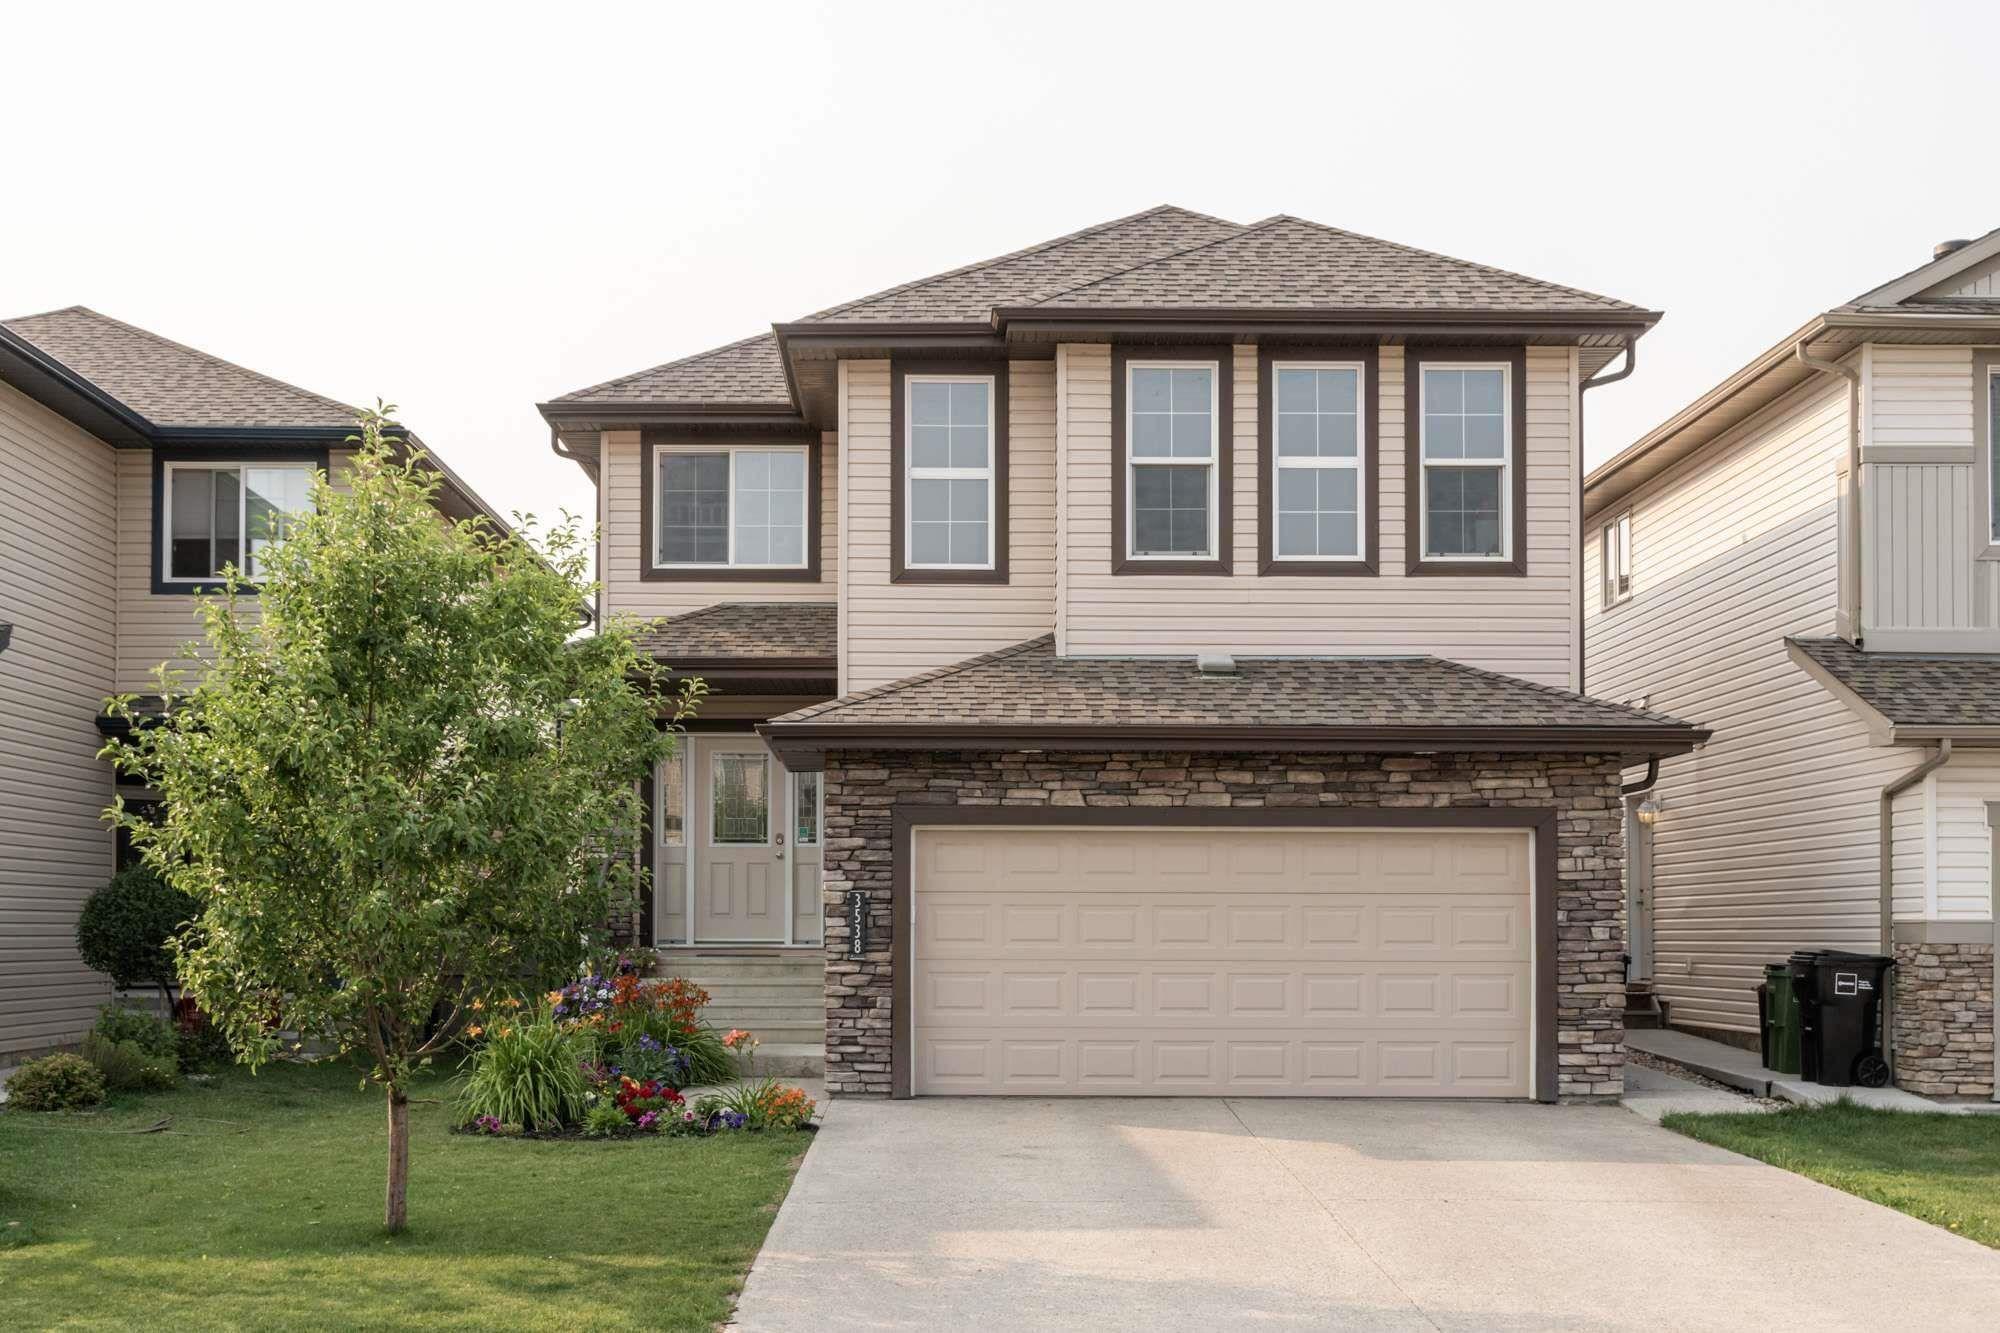 Main Photo: 3538 CLAXTON Crescent in Edmonton: Zone 55 House for sale : MLS®# E4256610